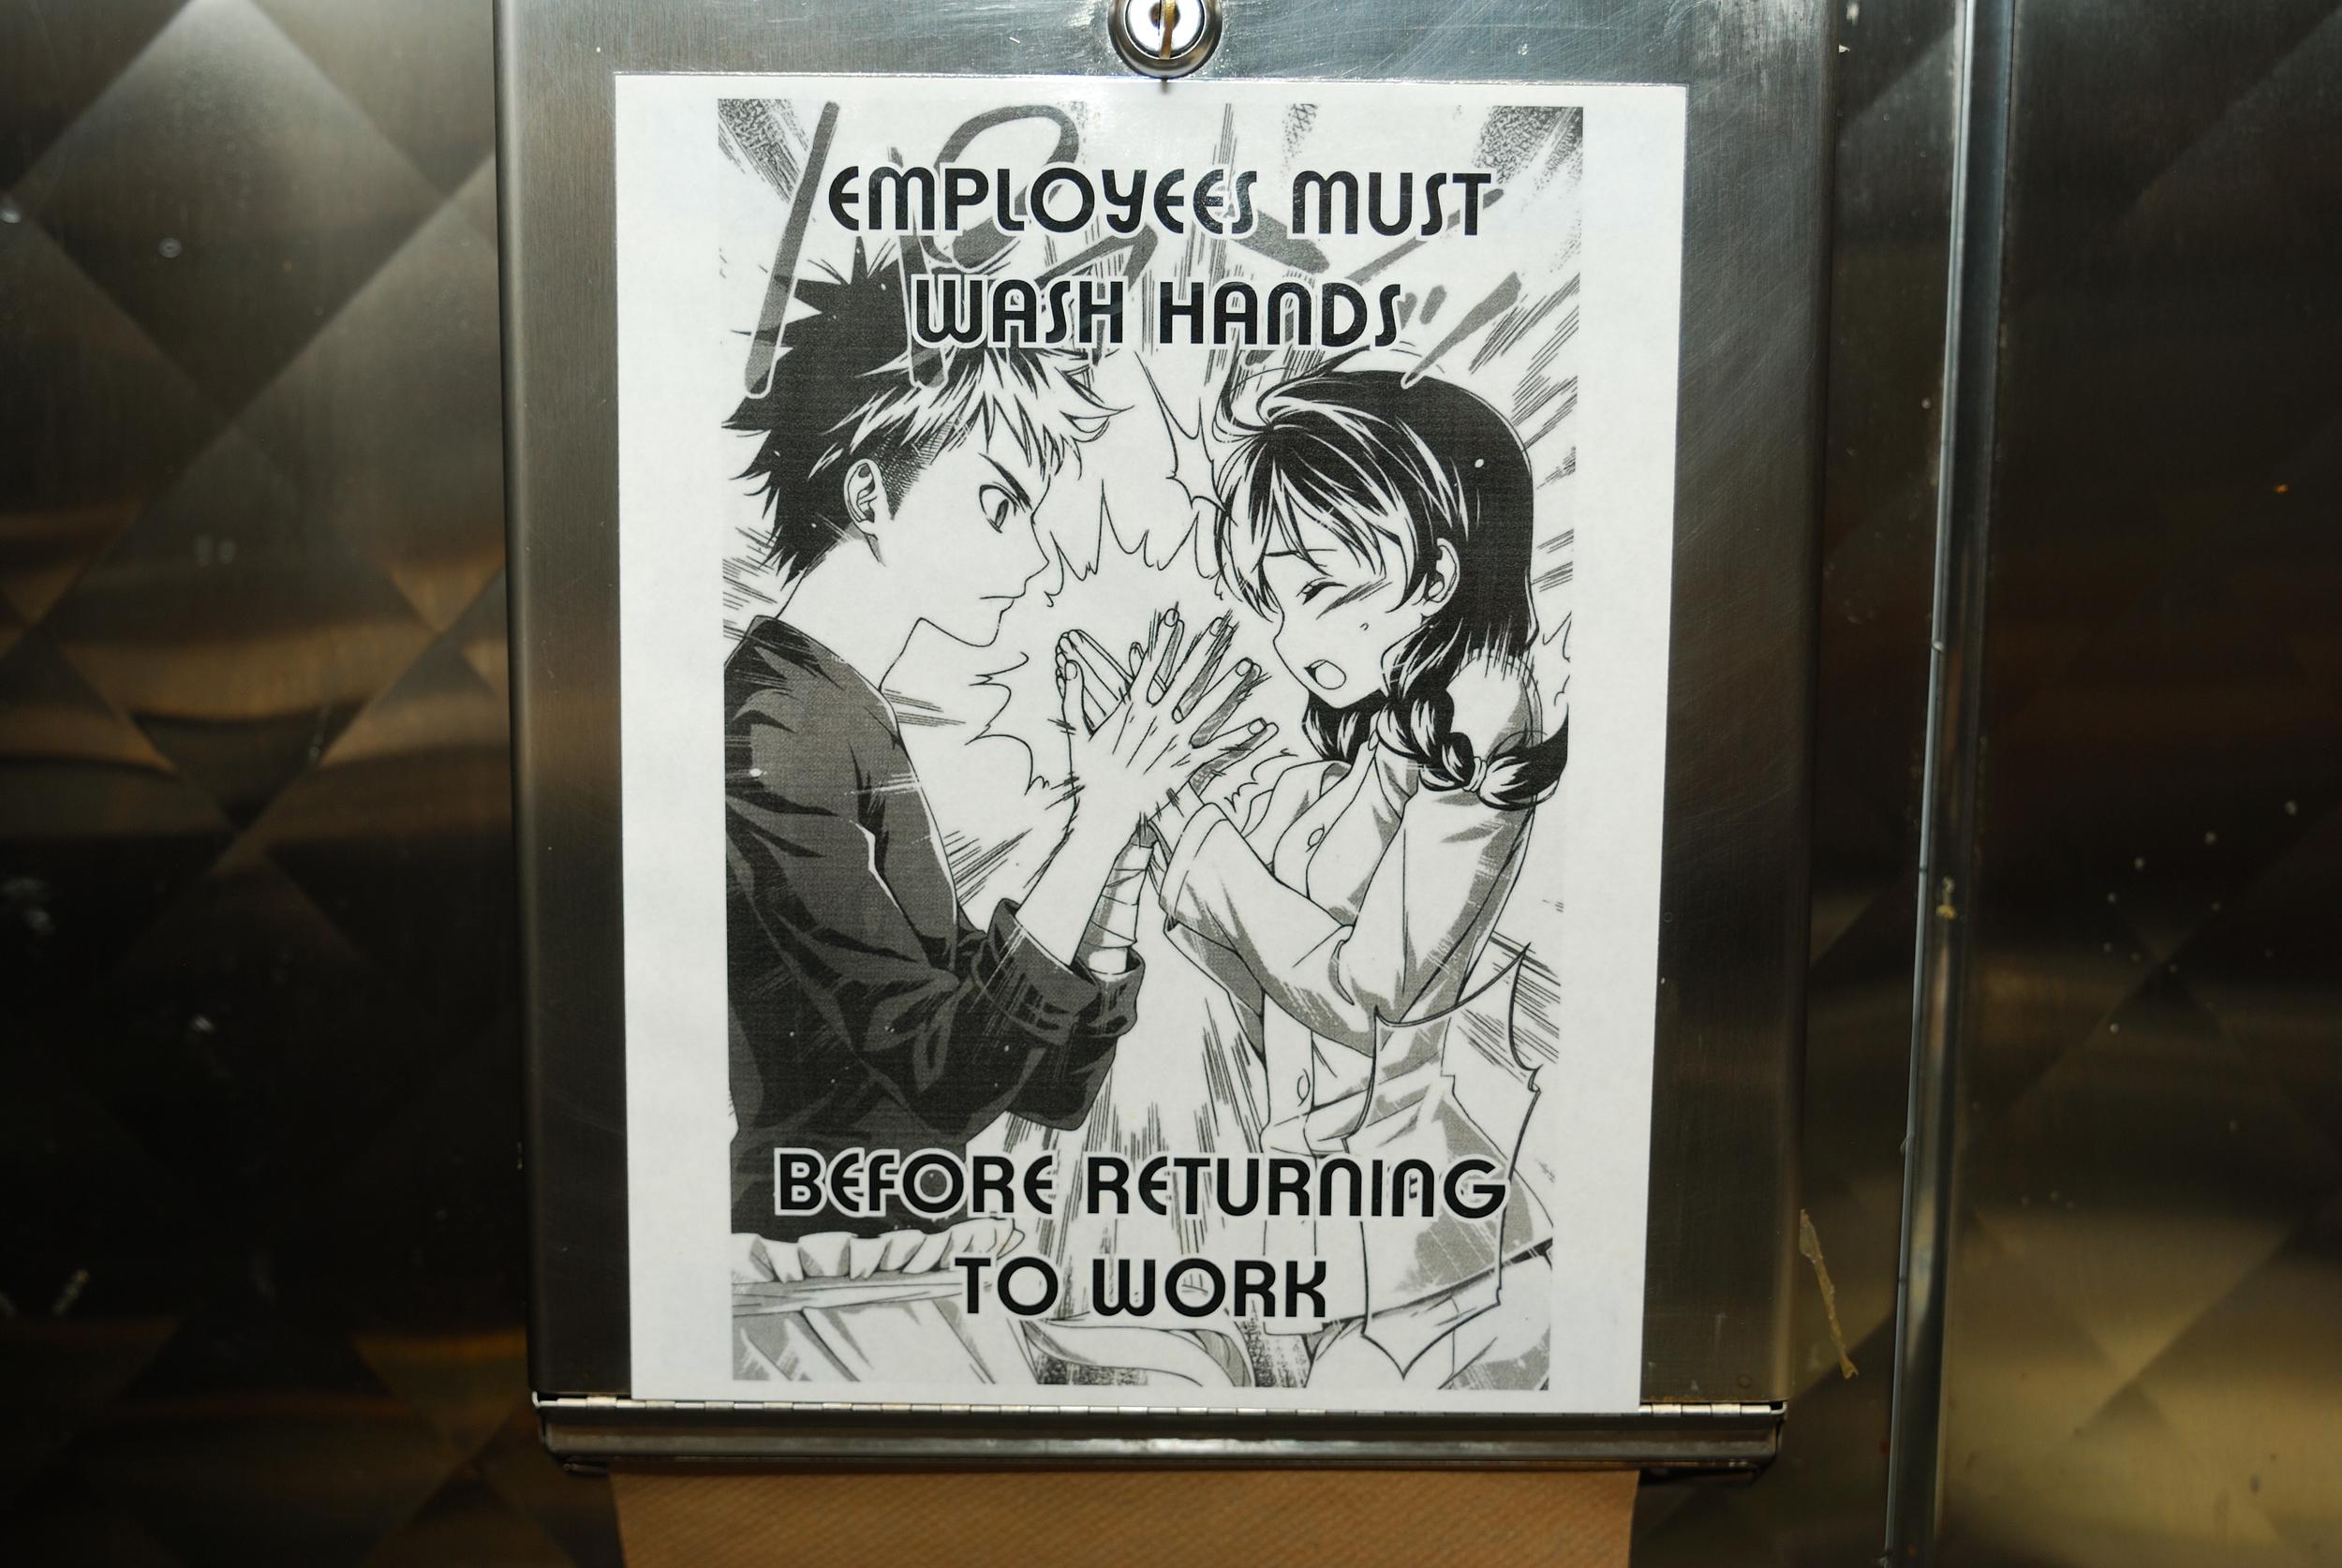 Must Wash Hands.JPG